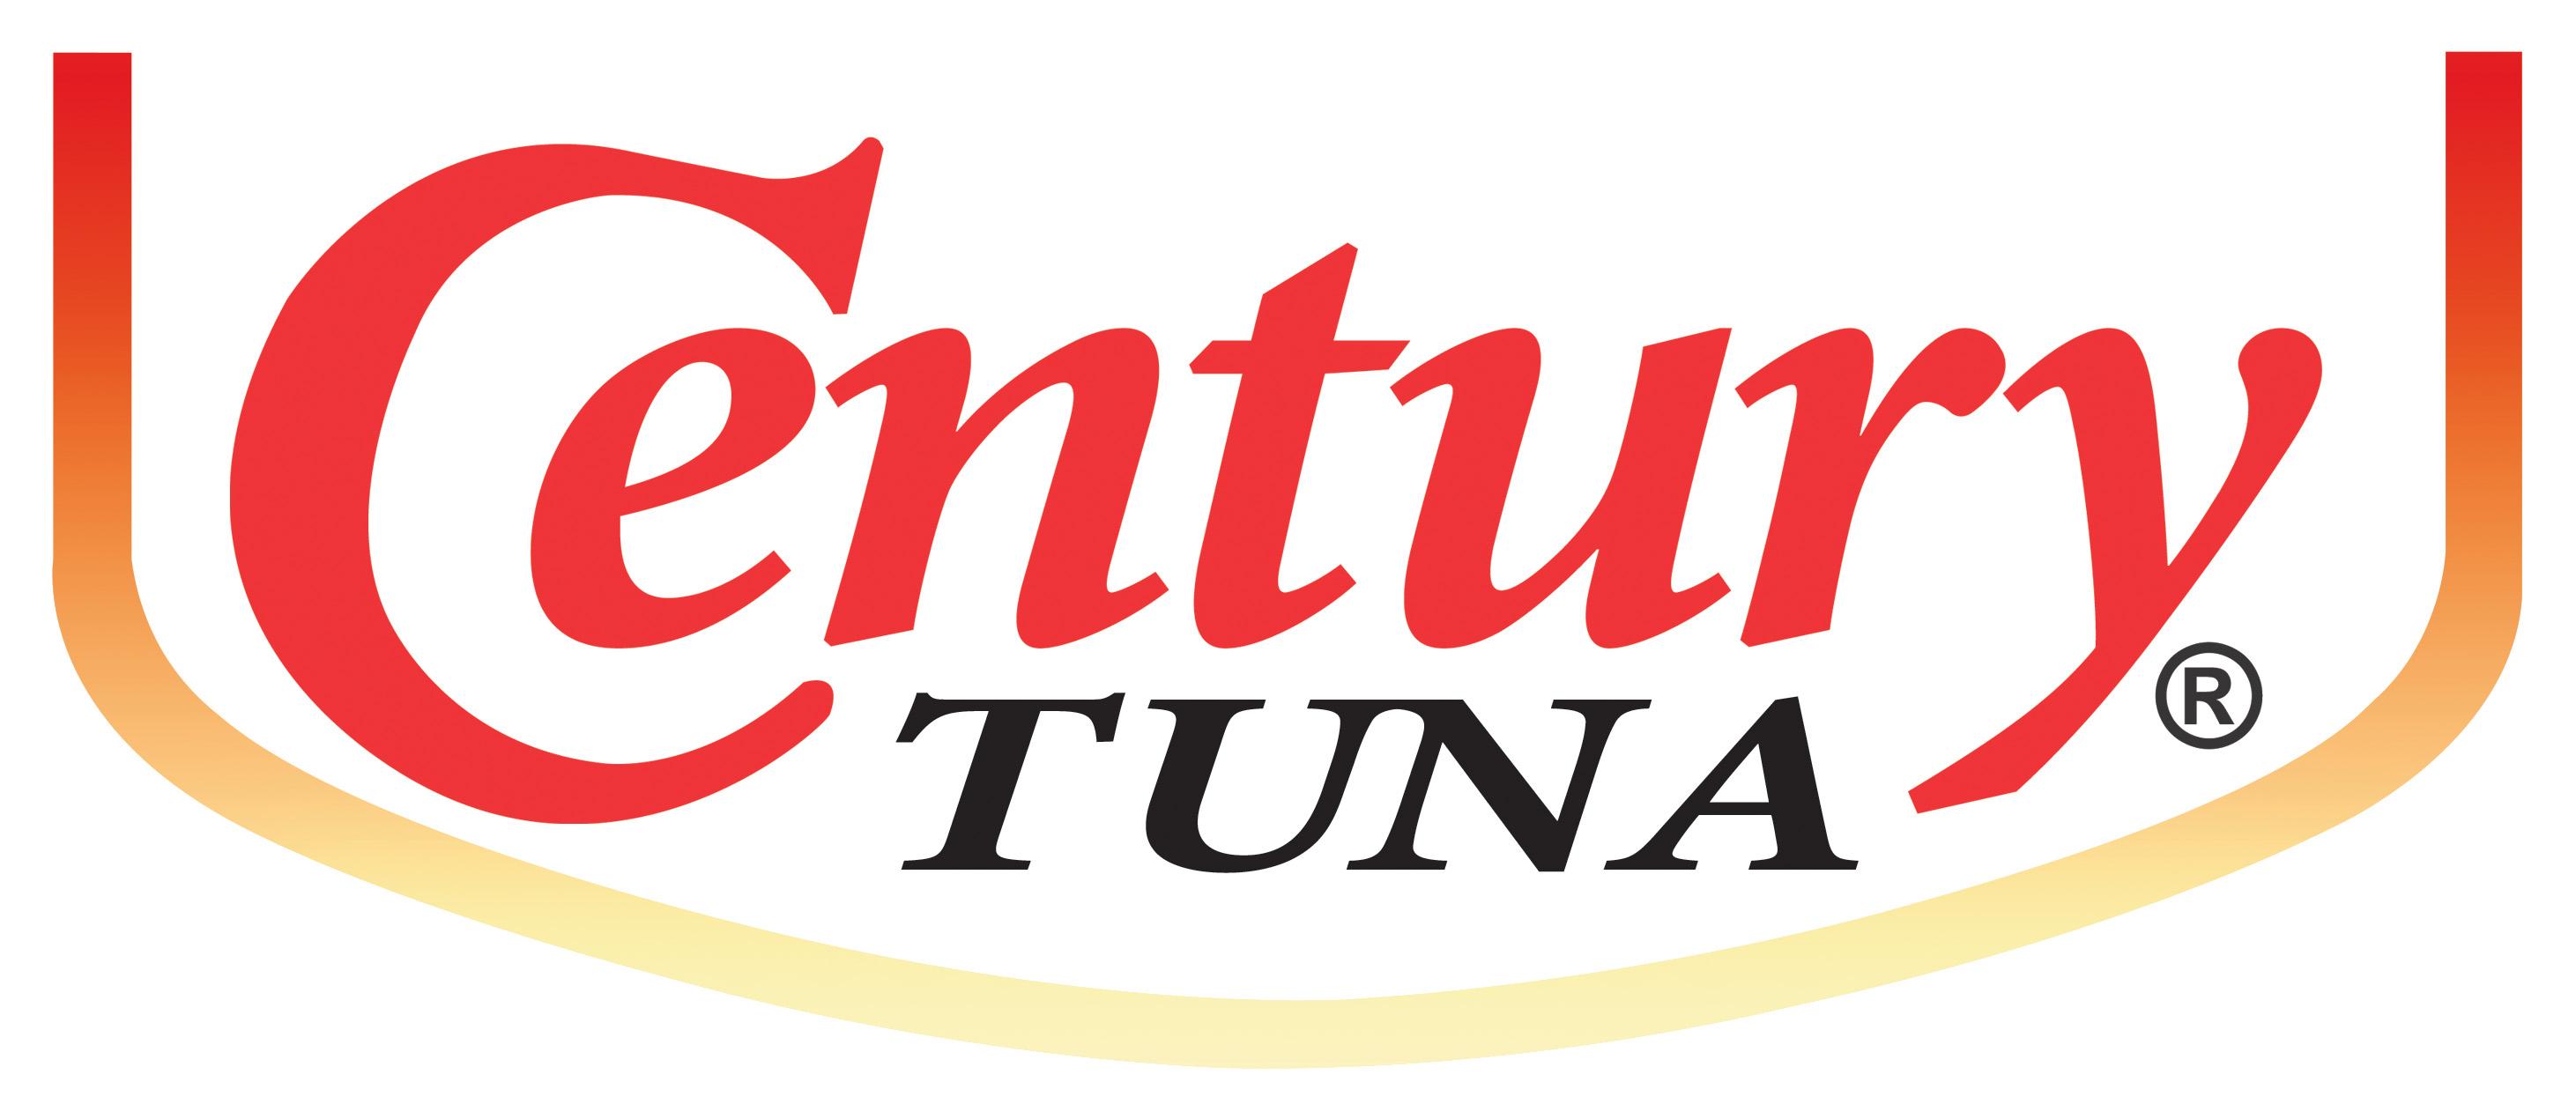 CENTURY TUNA LOGO.1